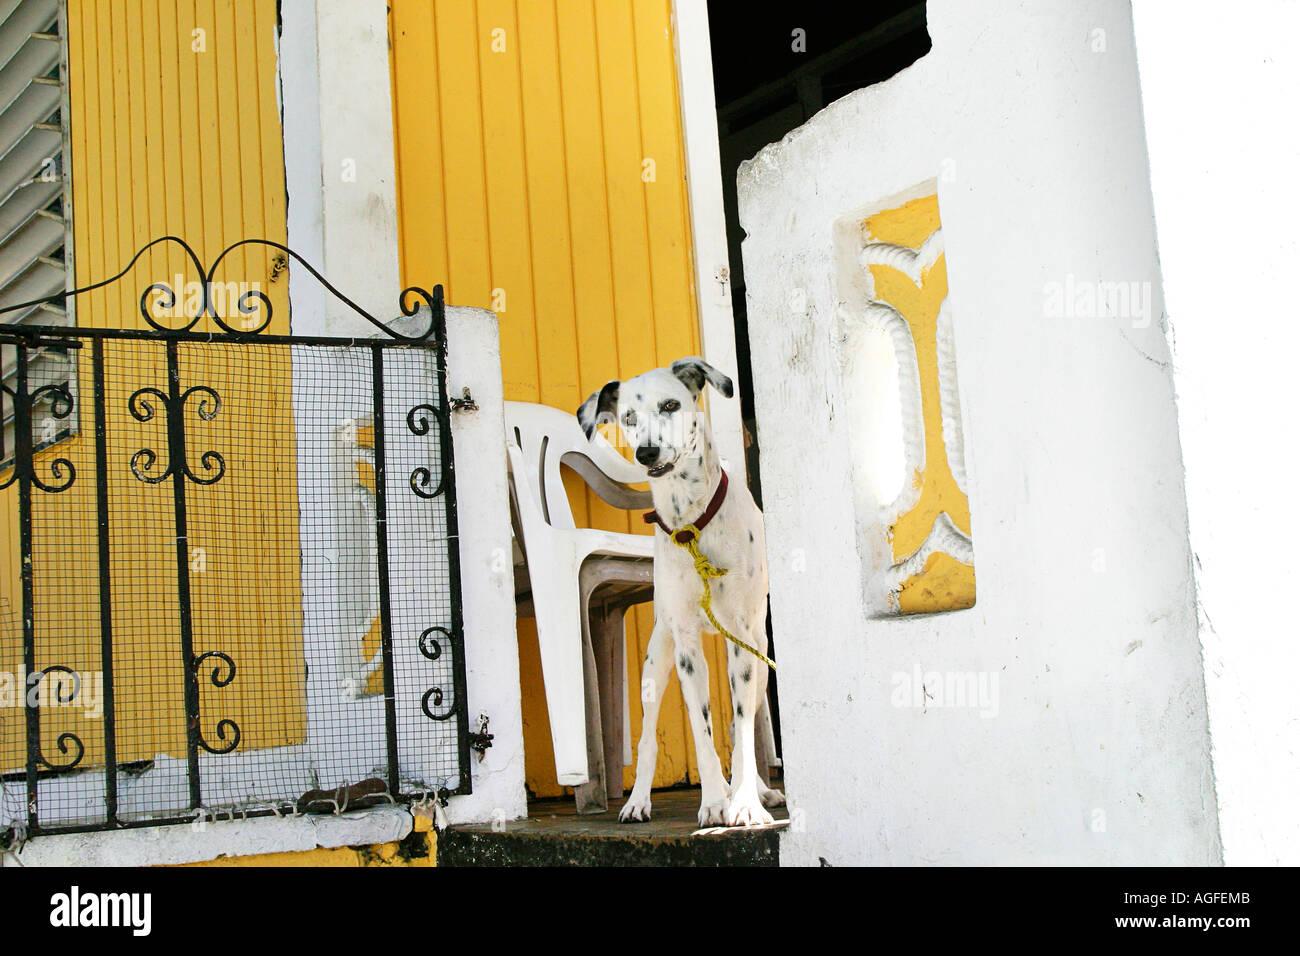 Puerto Barrios Stock Photos & Puerto Barrios Stock Images - Alamy